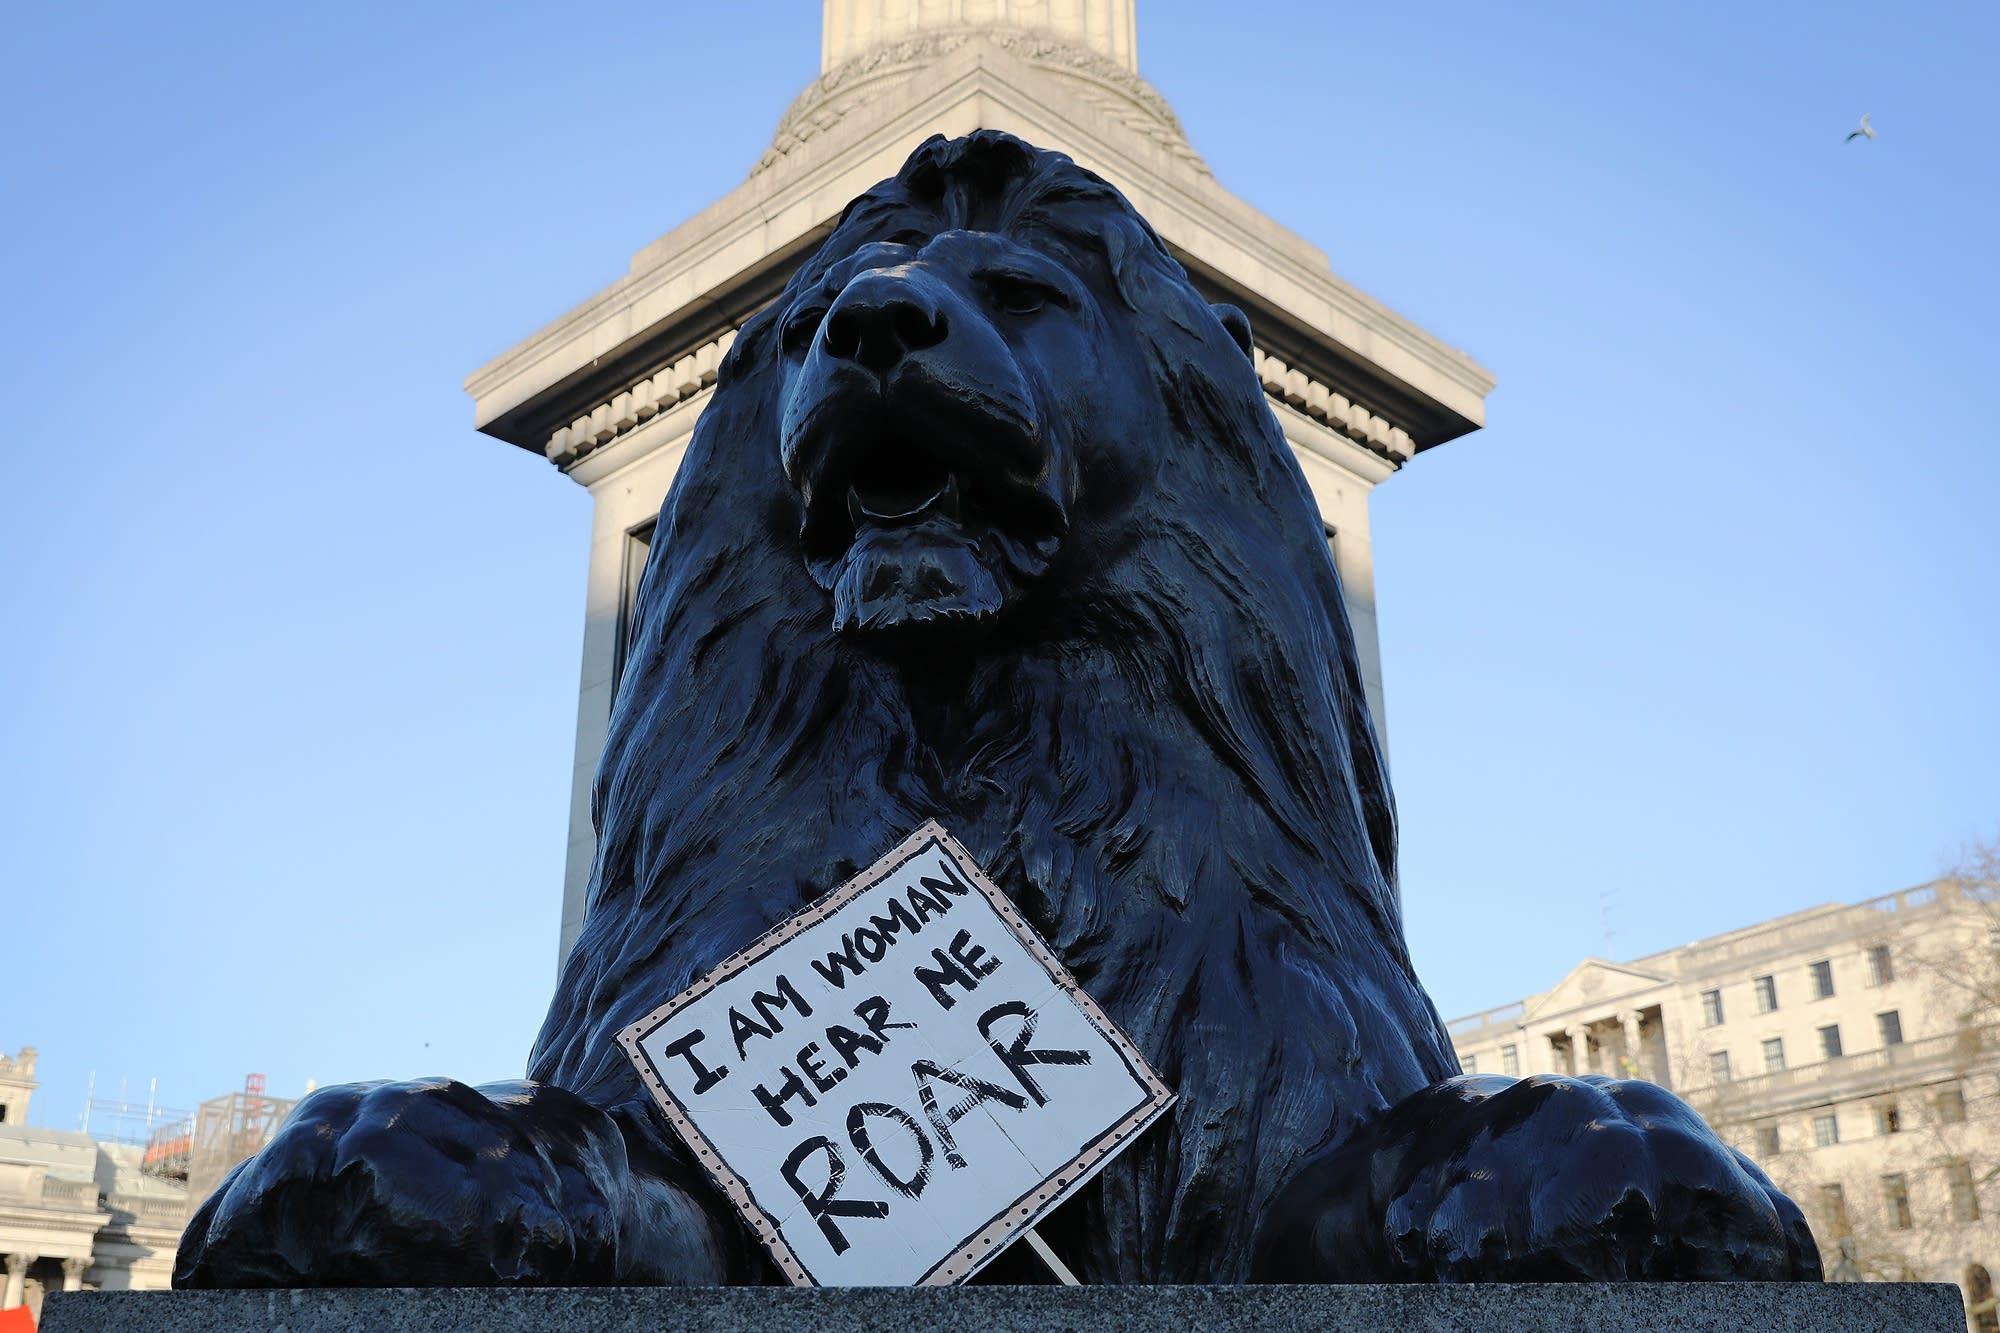 London, England: In Trafalgar Square, protesters gather.